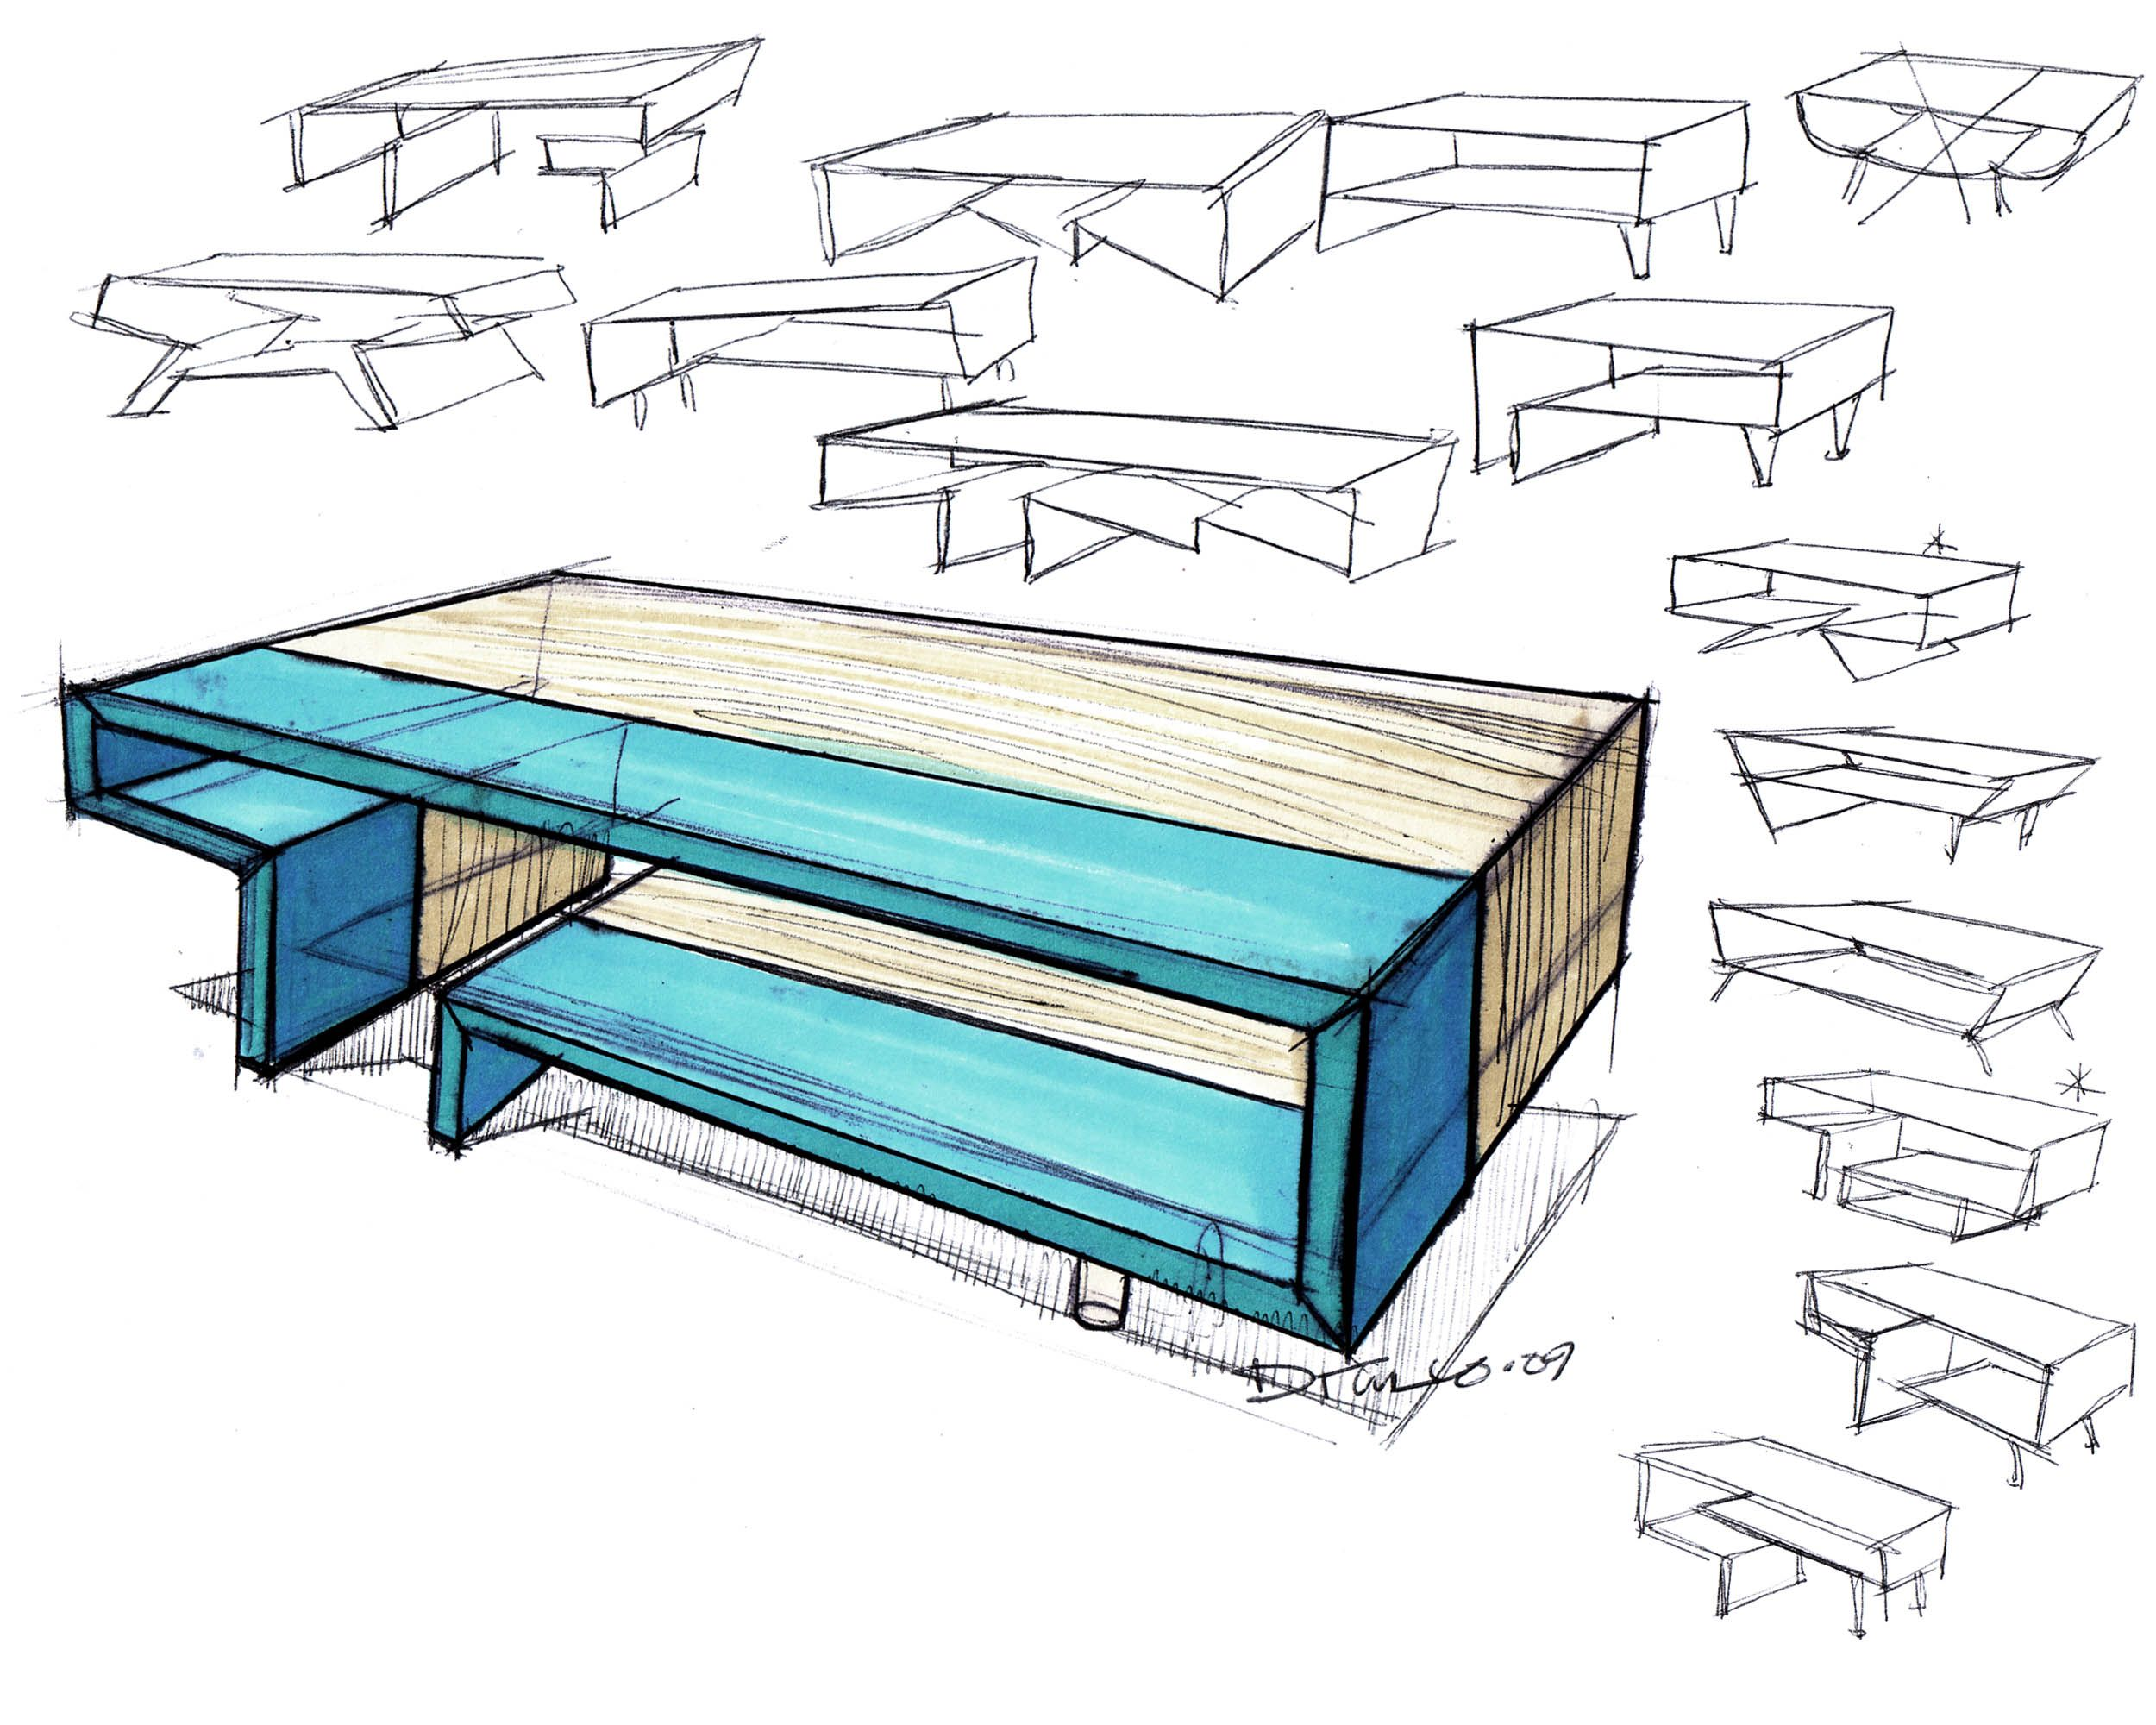 Furniture by michael ditullo at coroflot com